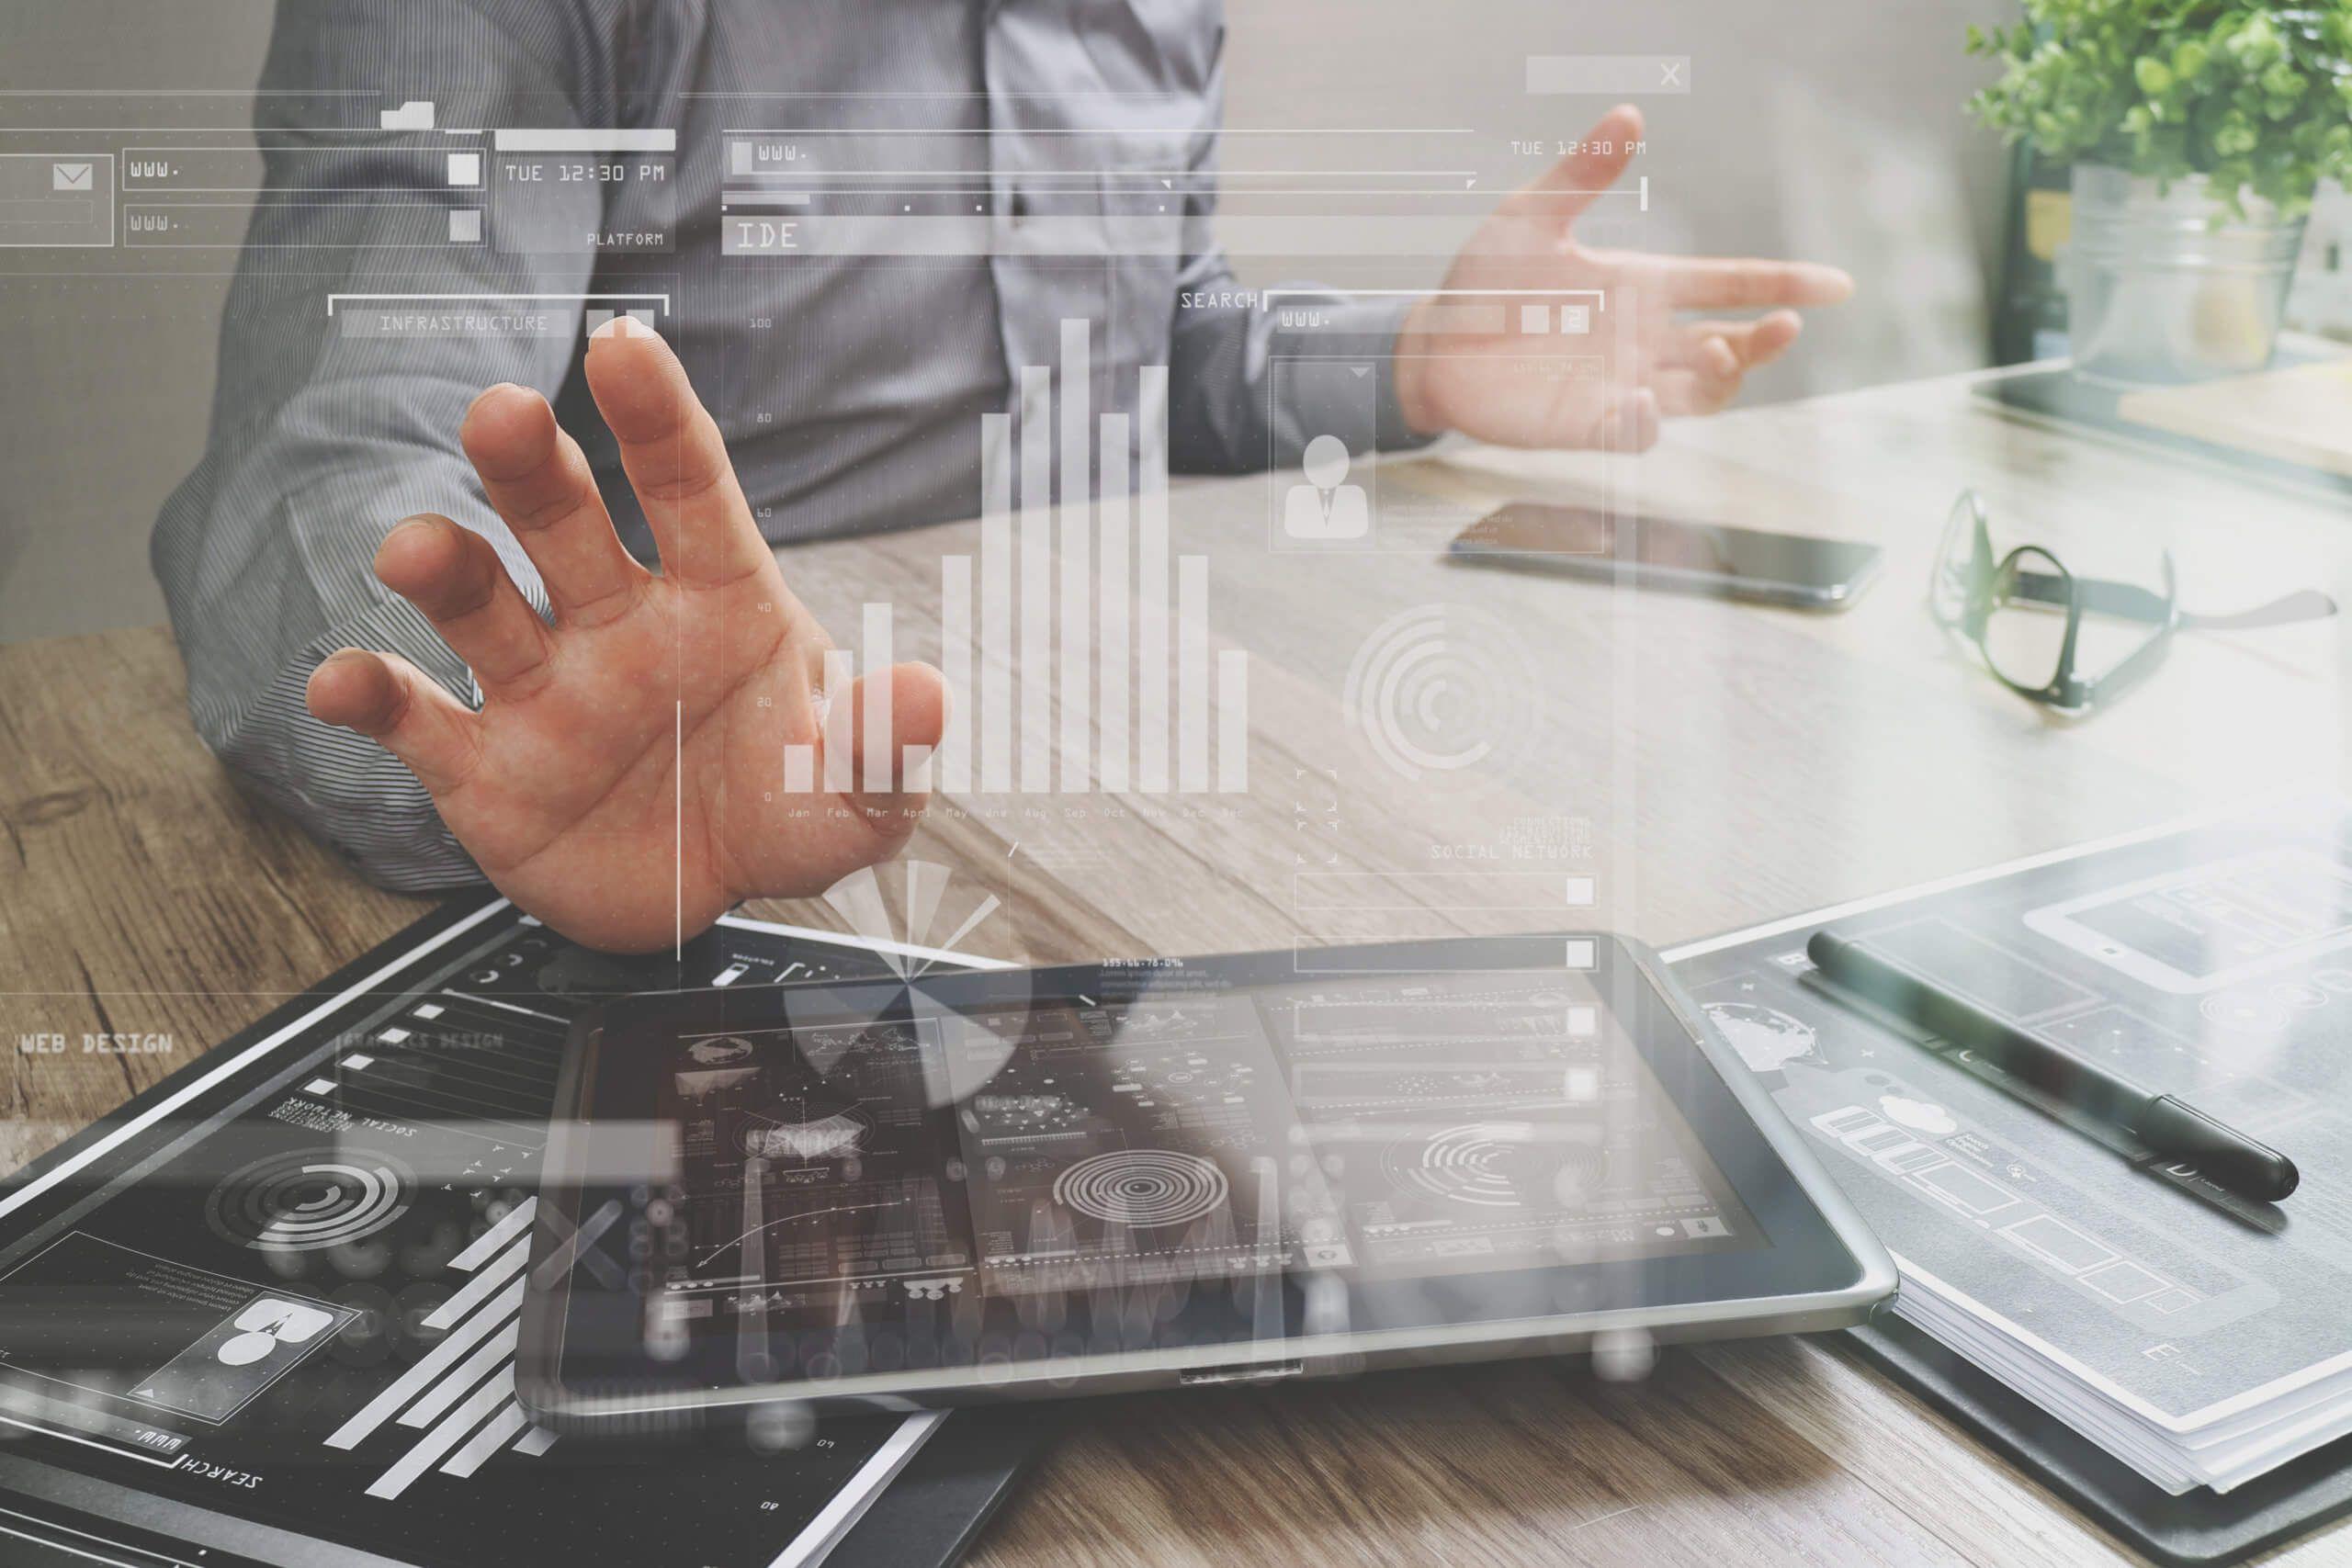 The Best Digital Marketing Methods for Your HVAC Business